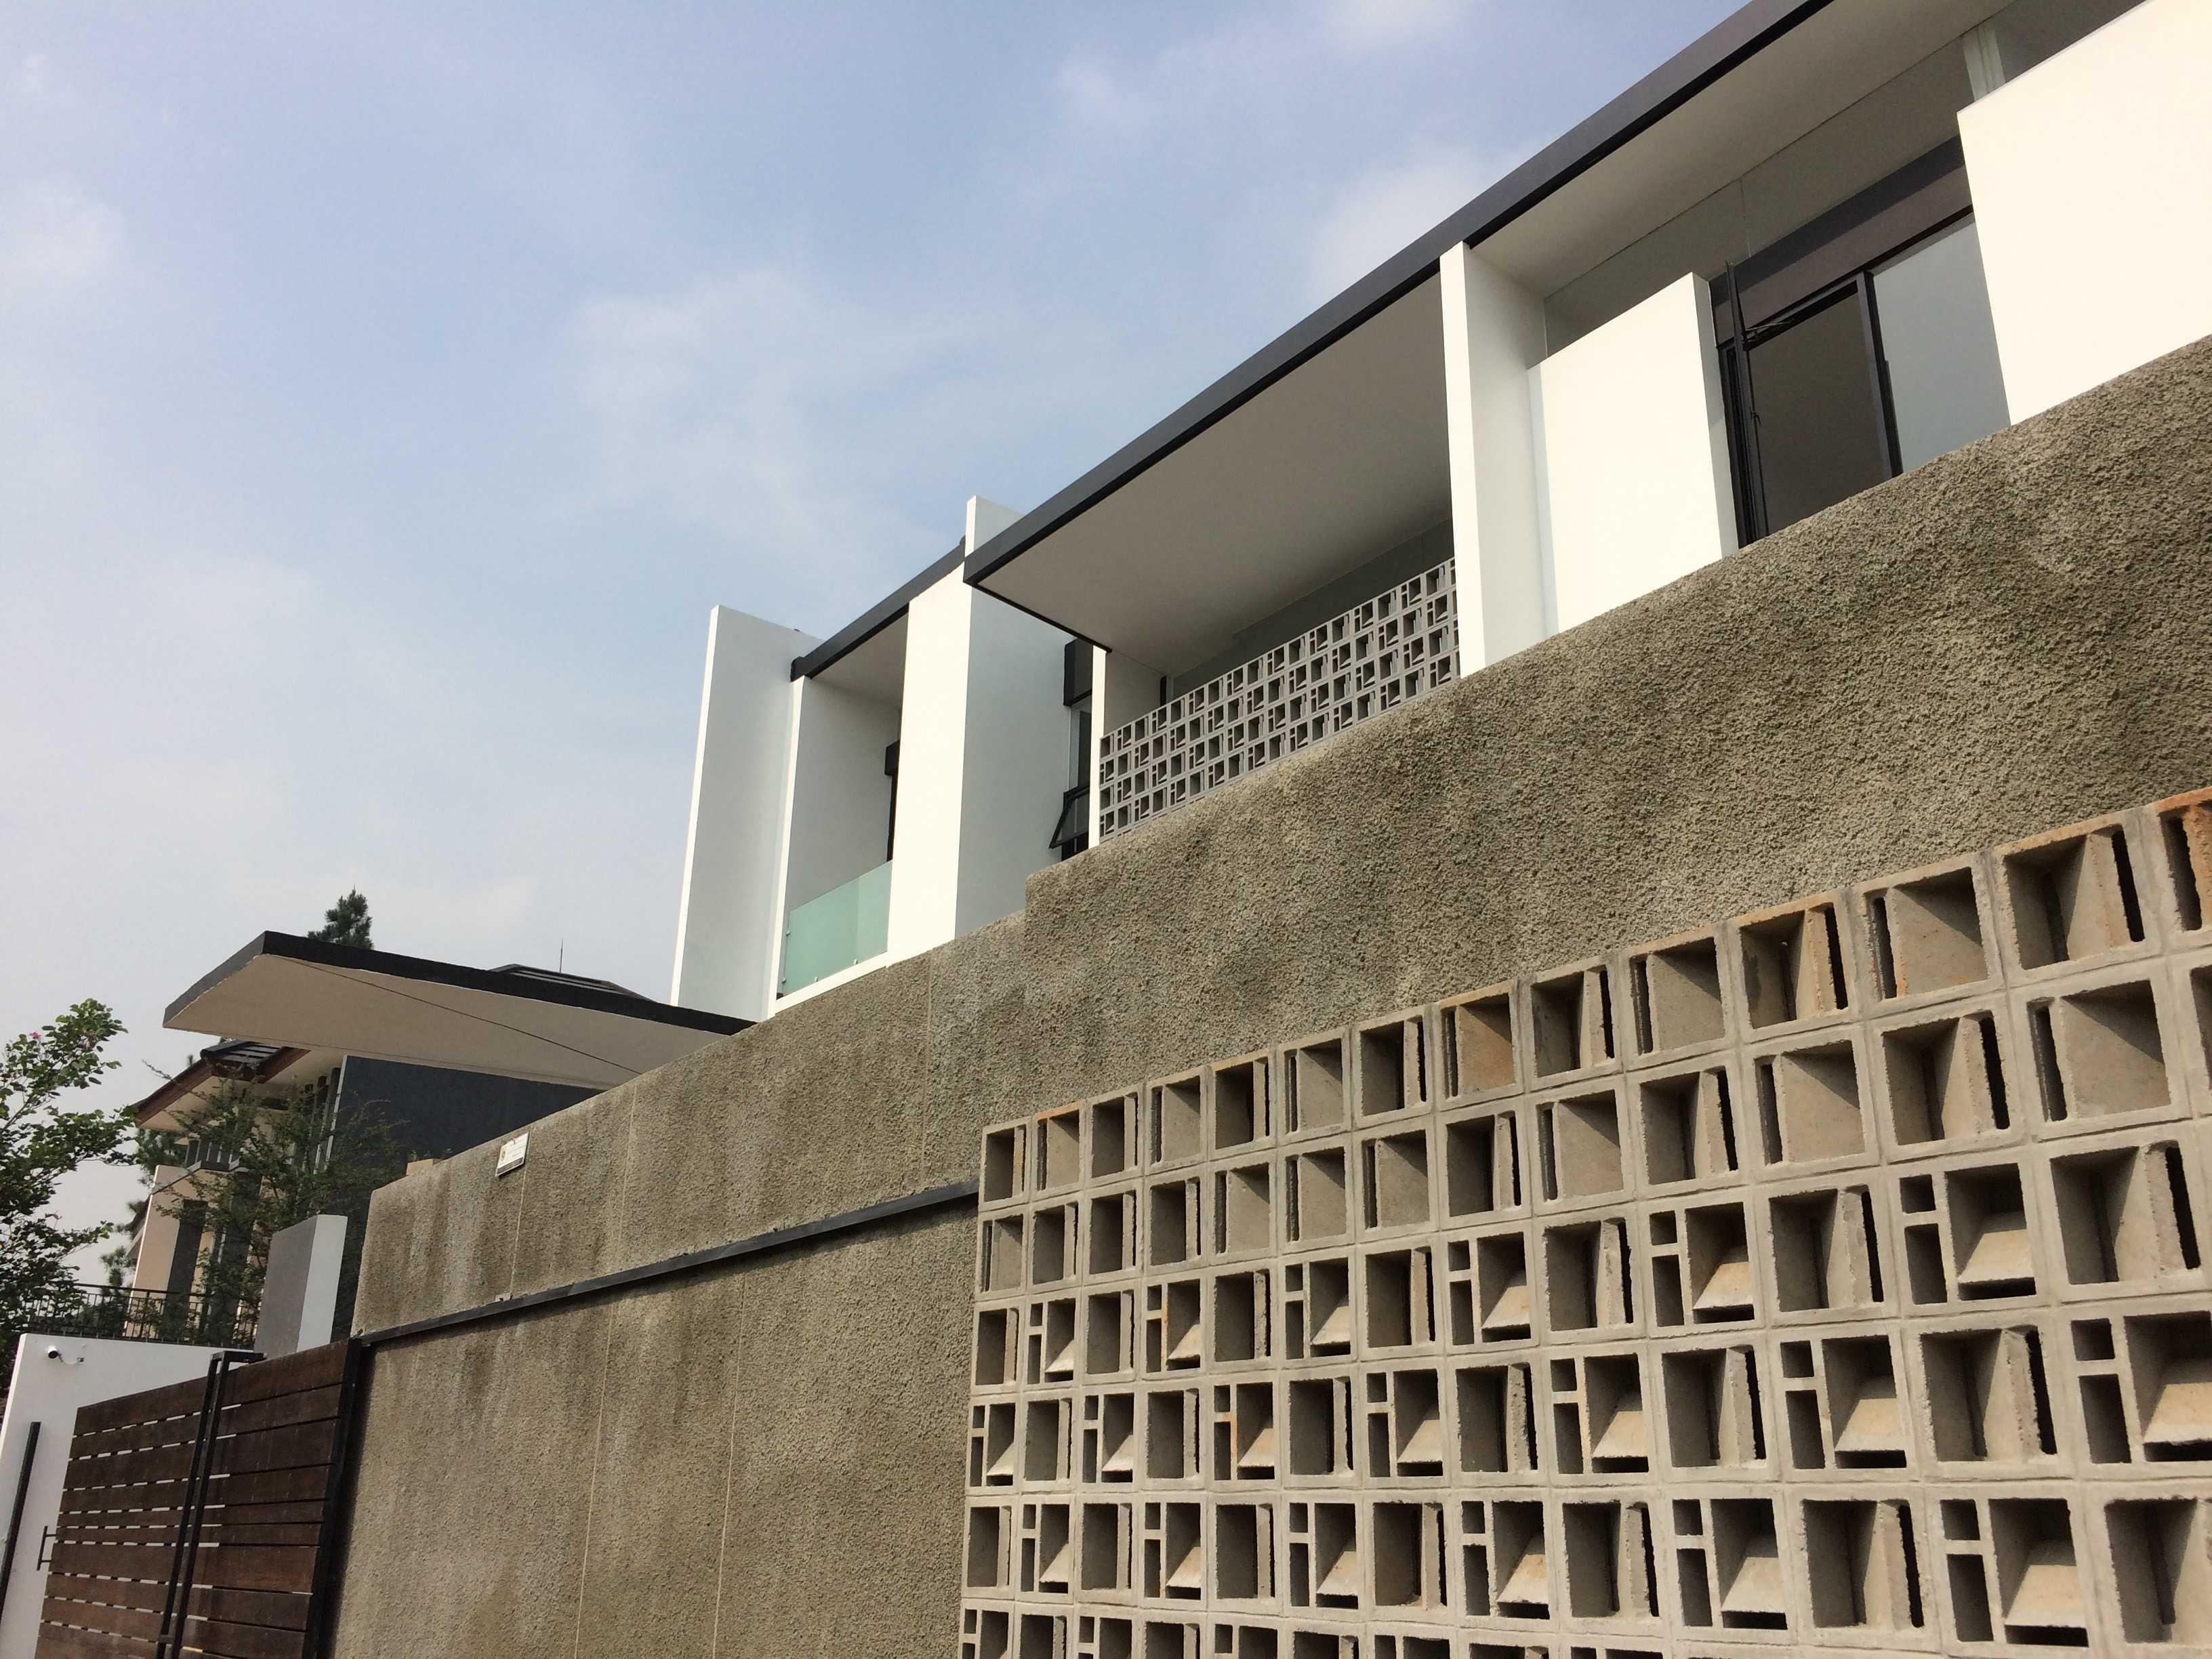 Jerry M. Febrino Rs House Jl. Pesona Paris, Ciangsana, Gn. Putri, Bogor, Jawa Barat 16968, Indonesia Kota Wisata Facelift Modern  14911